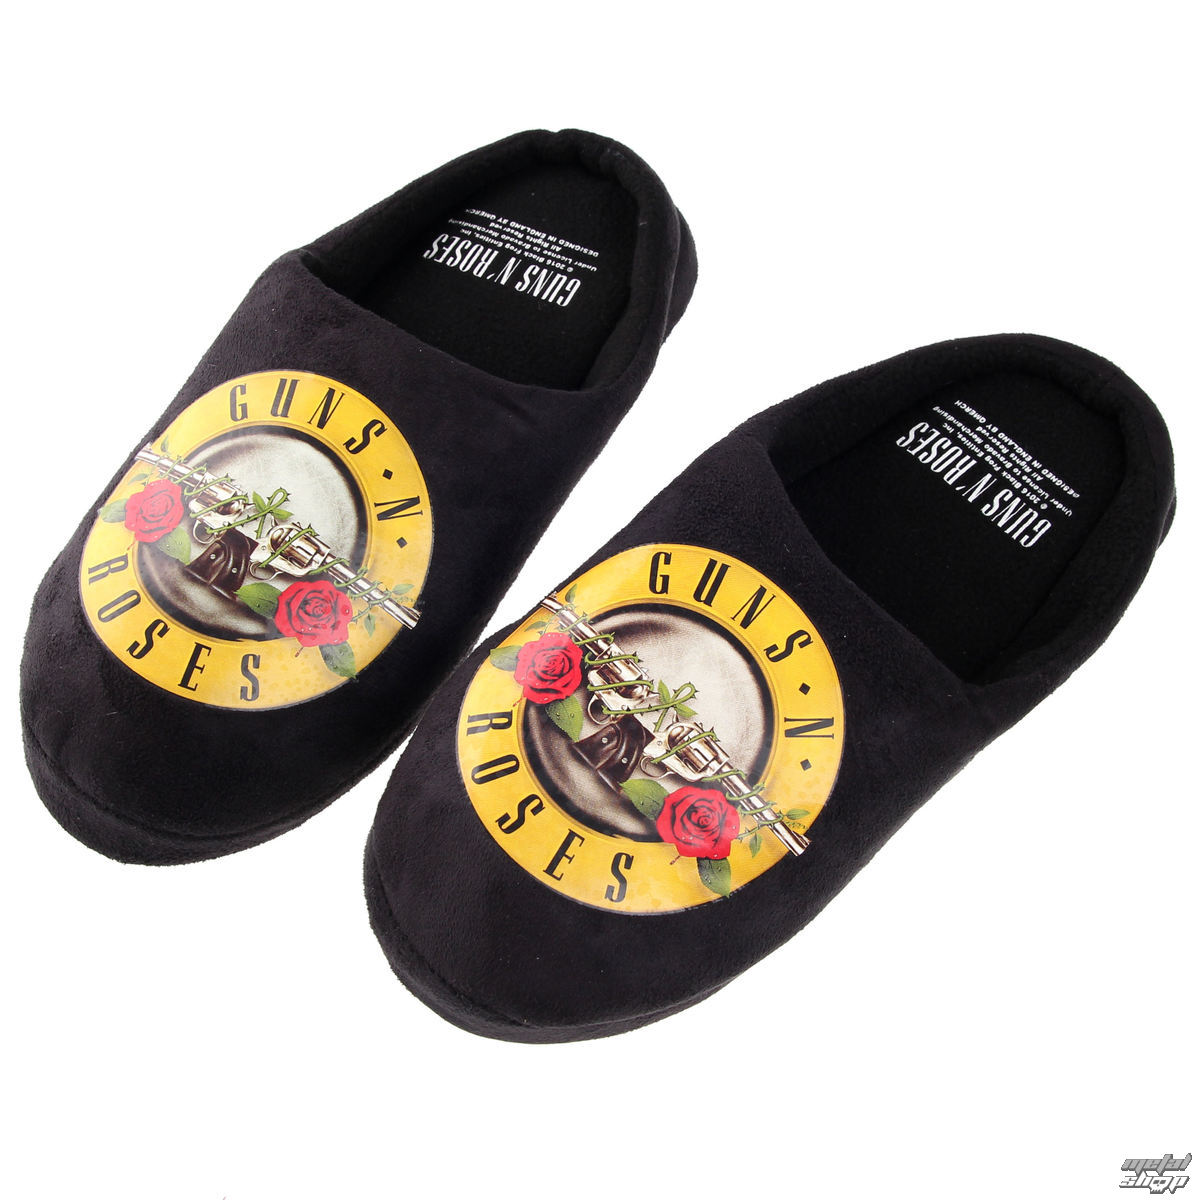 papuče Guns N Roses - RCK002